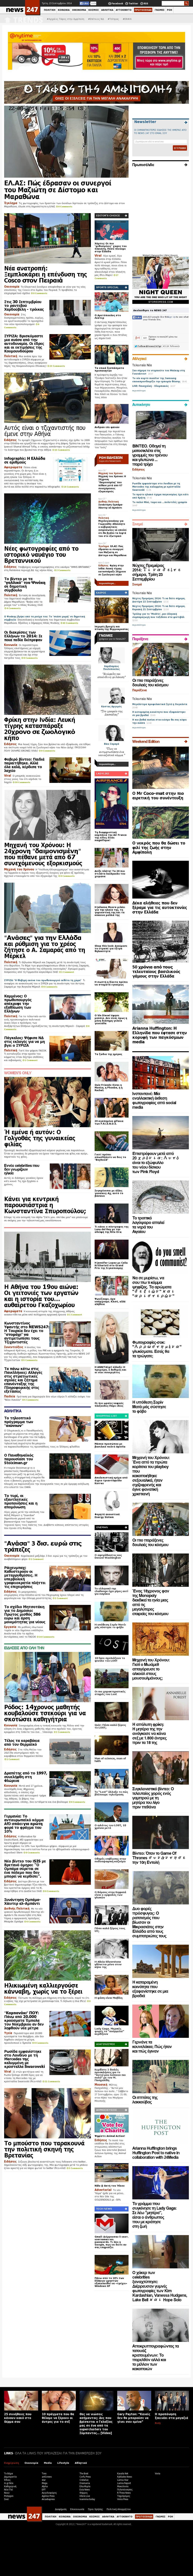 News 247 at Tuesday Sept. 23, 2014, 4:13 p.m. UTC